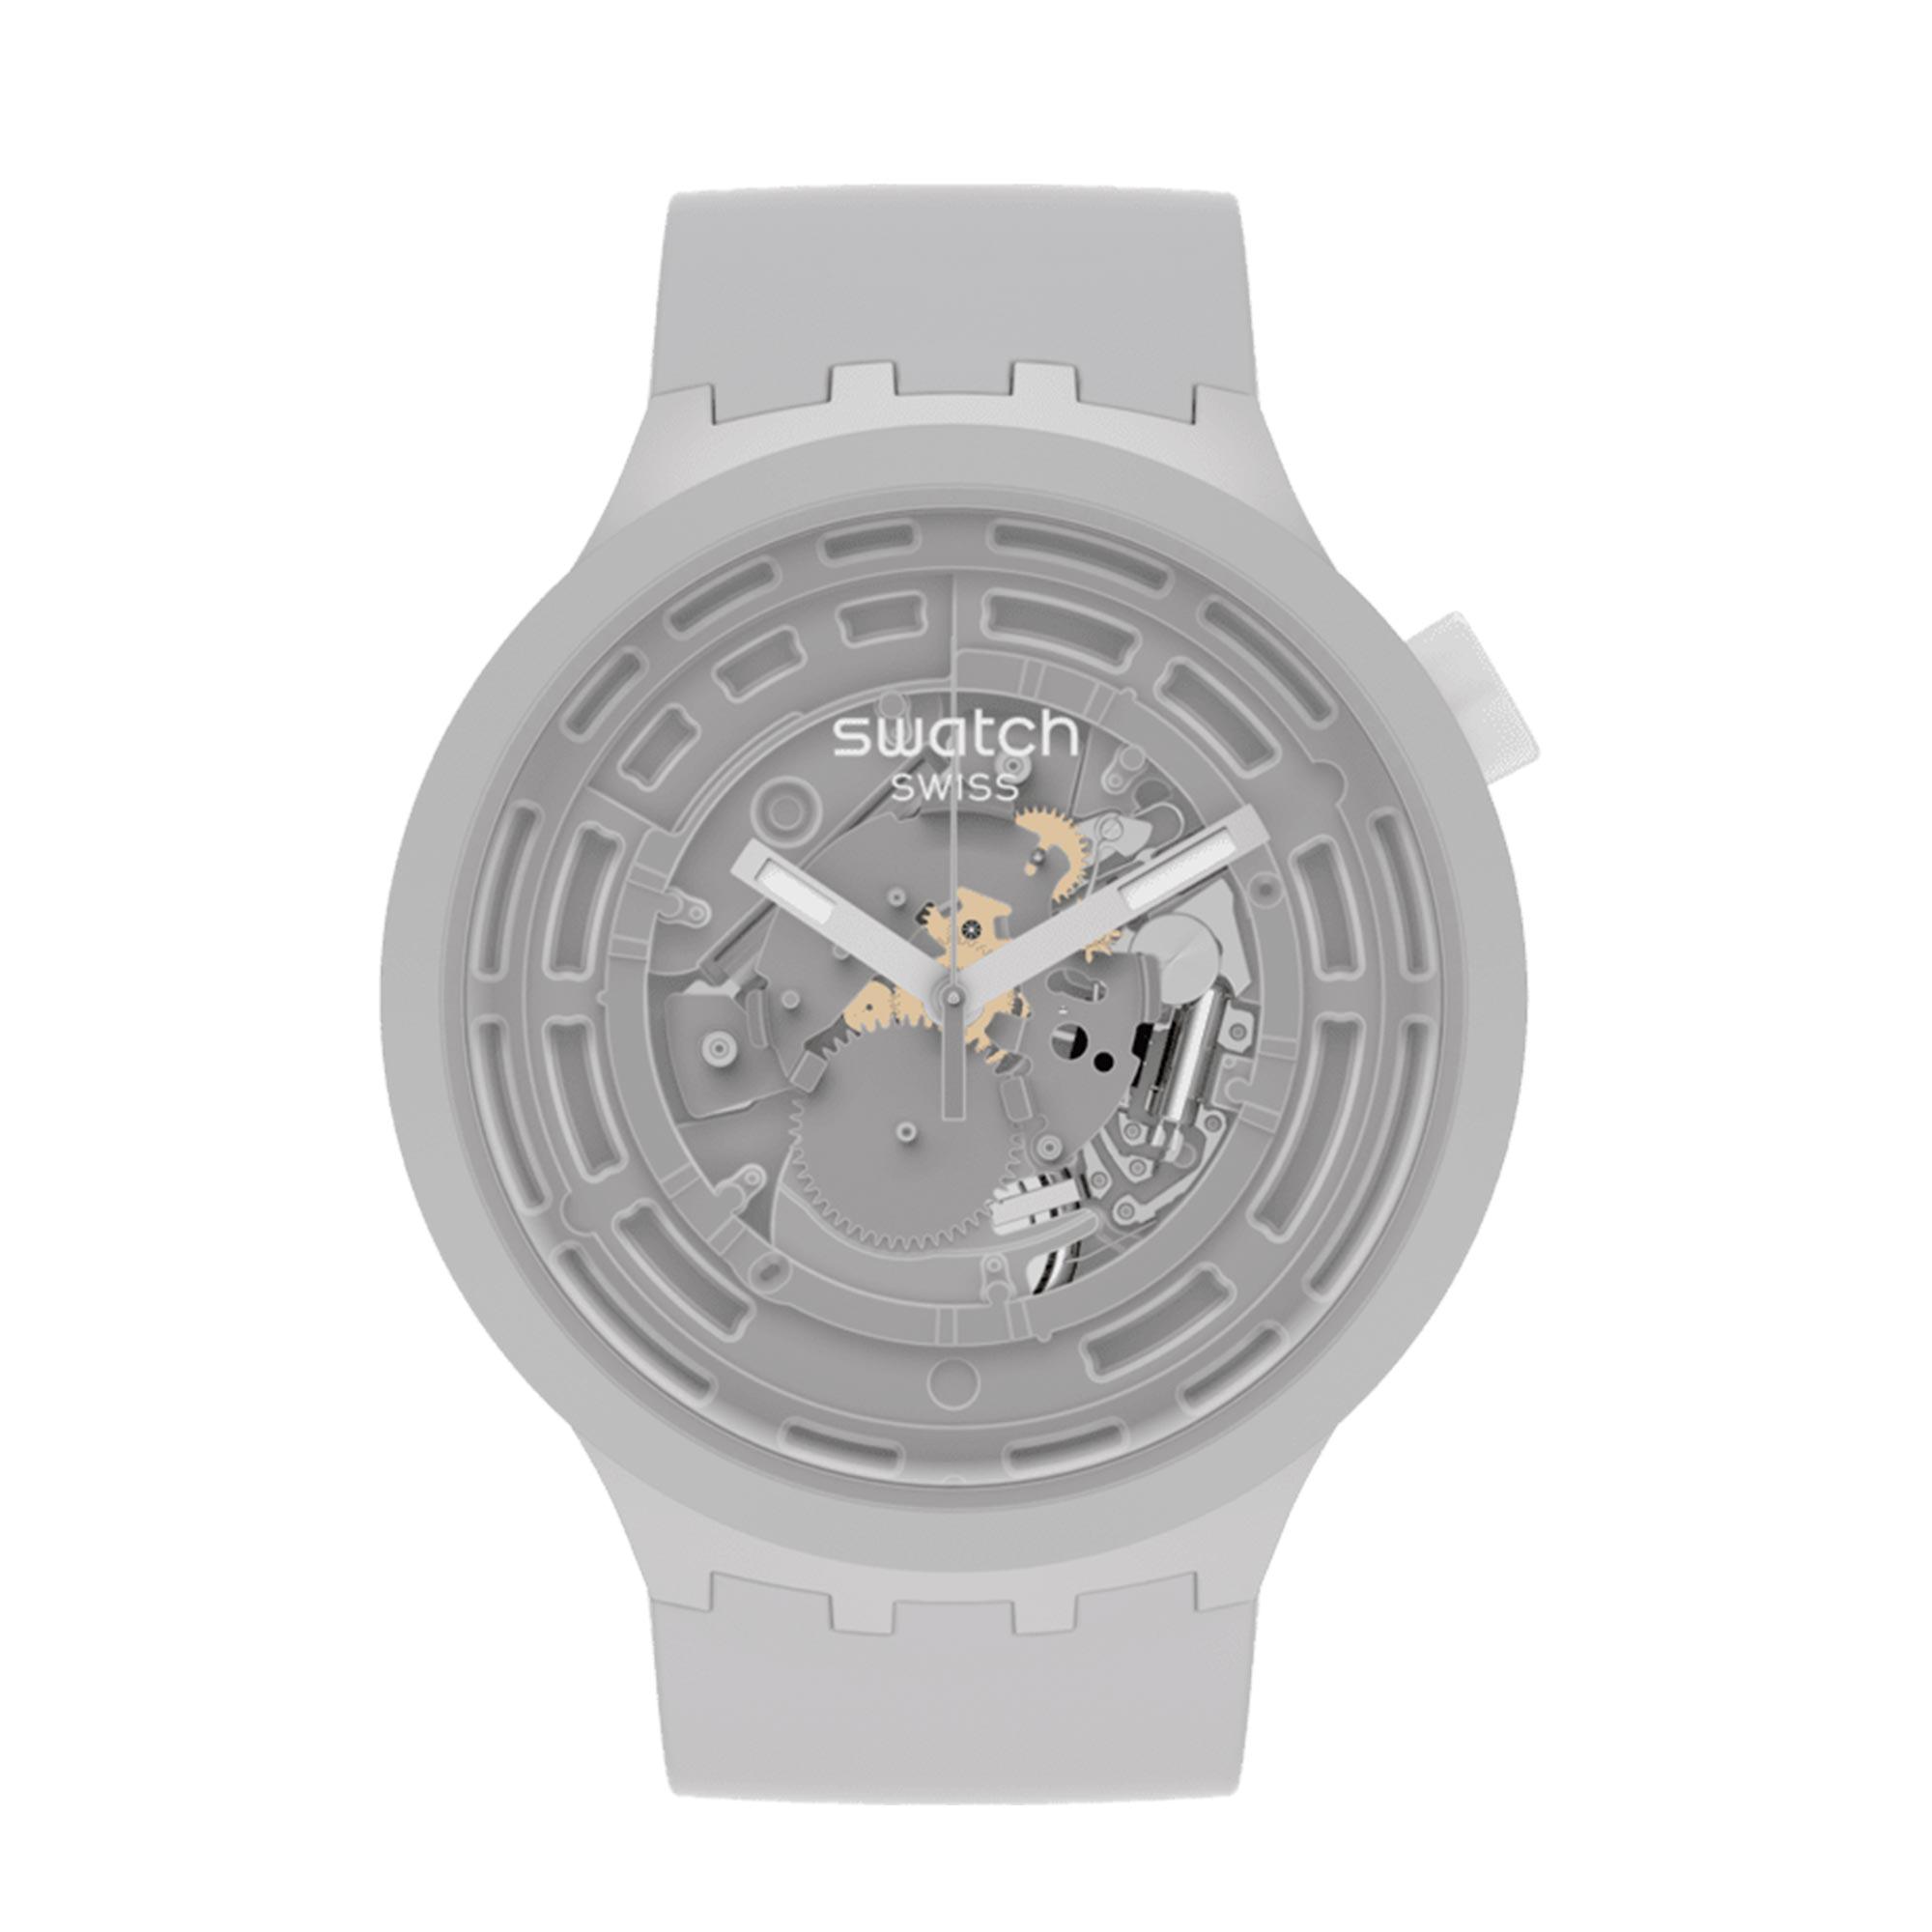 Swatch Big Bold Next Quartz Grey Watch Bio-sourced Grey Strap SB03M100